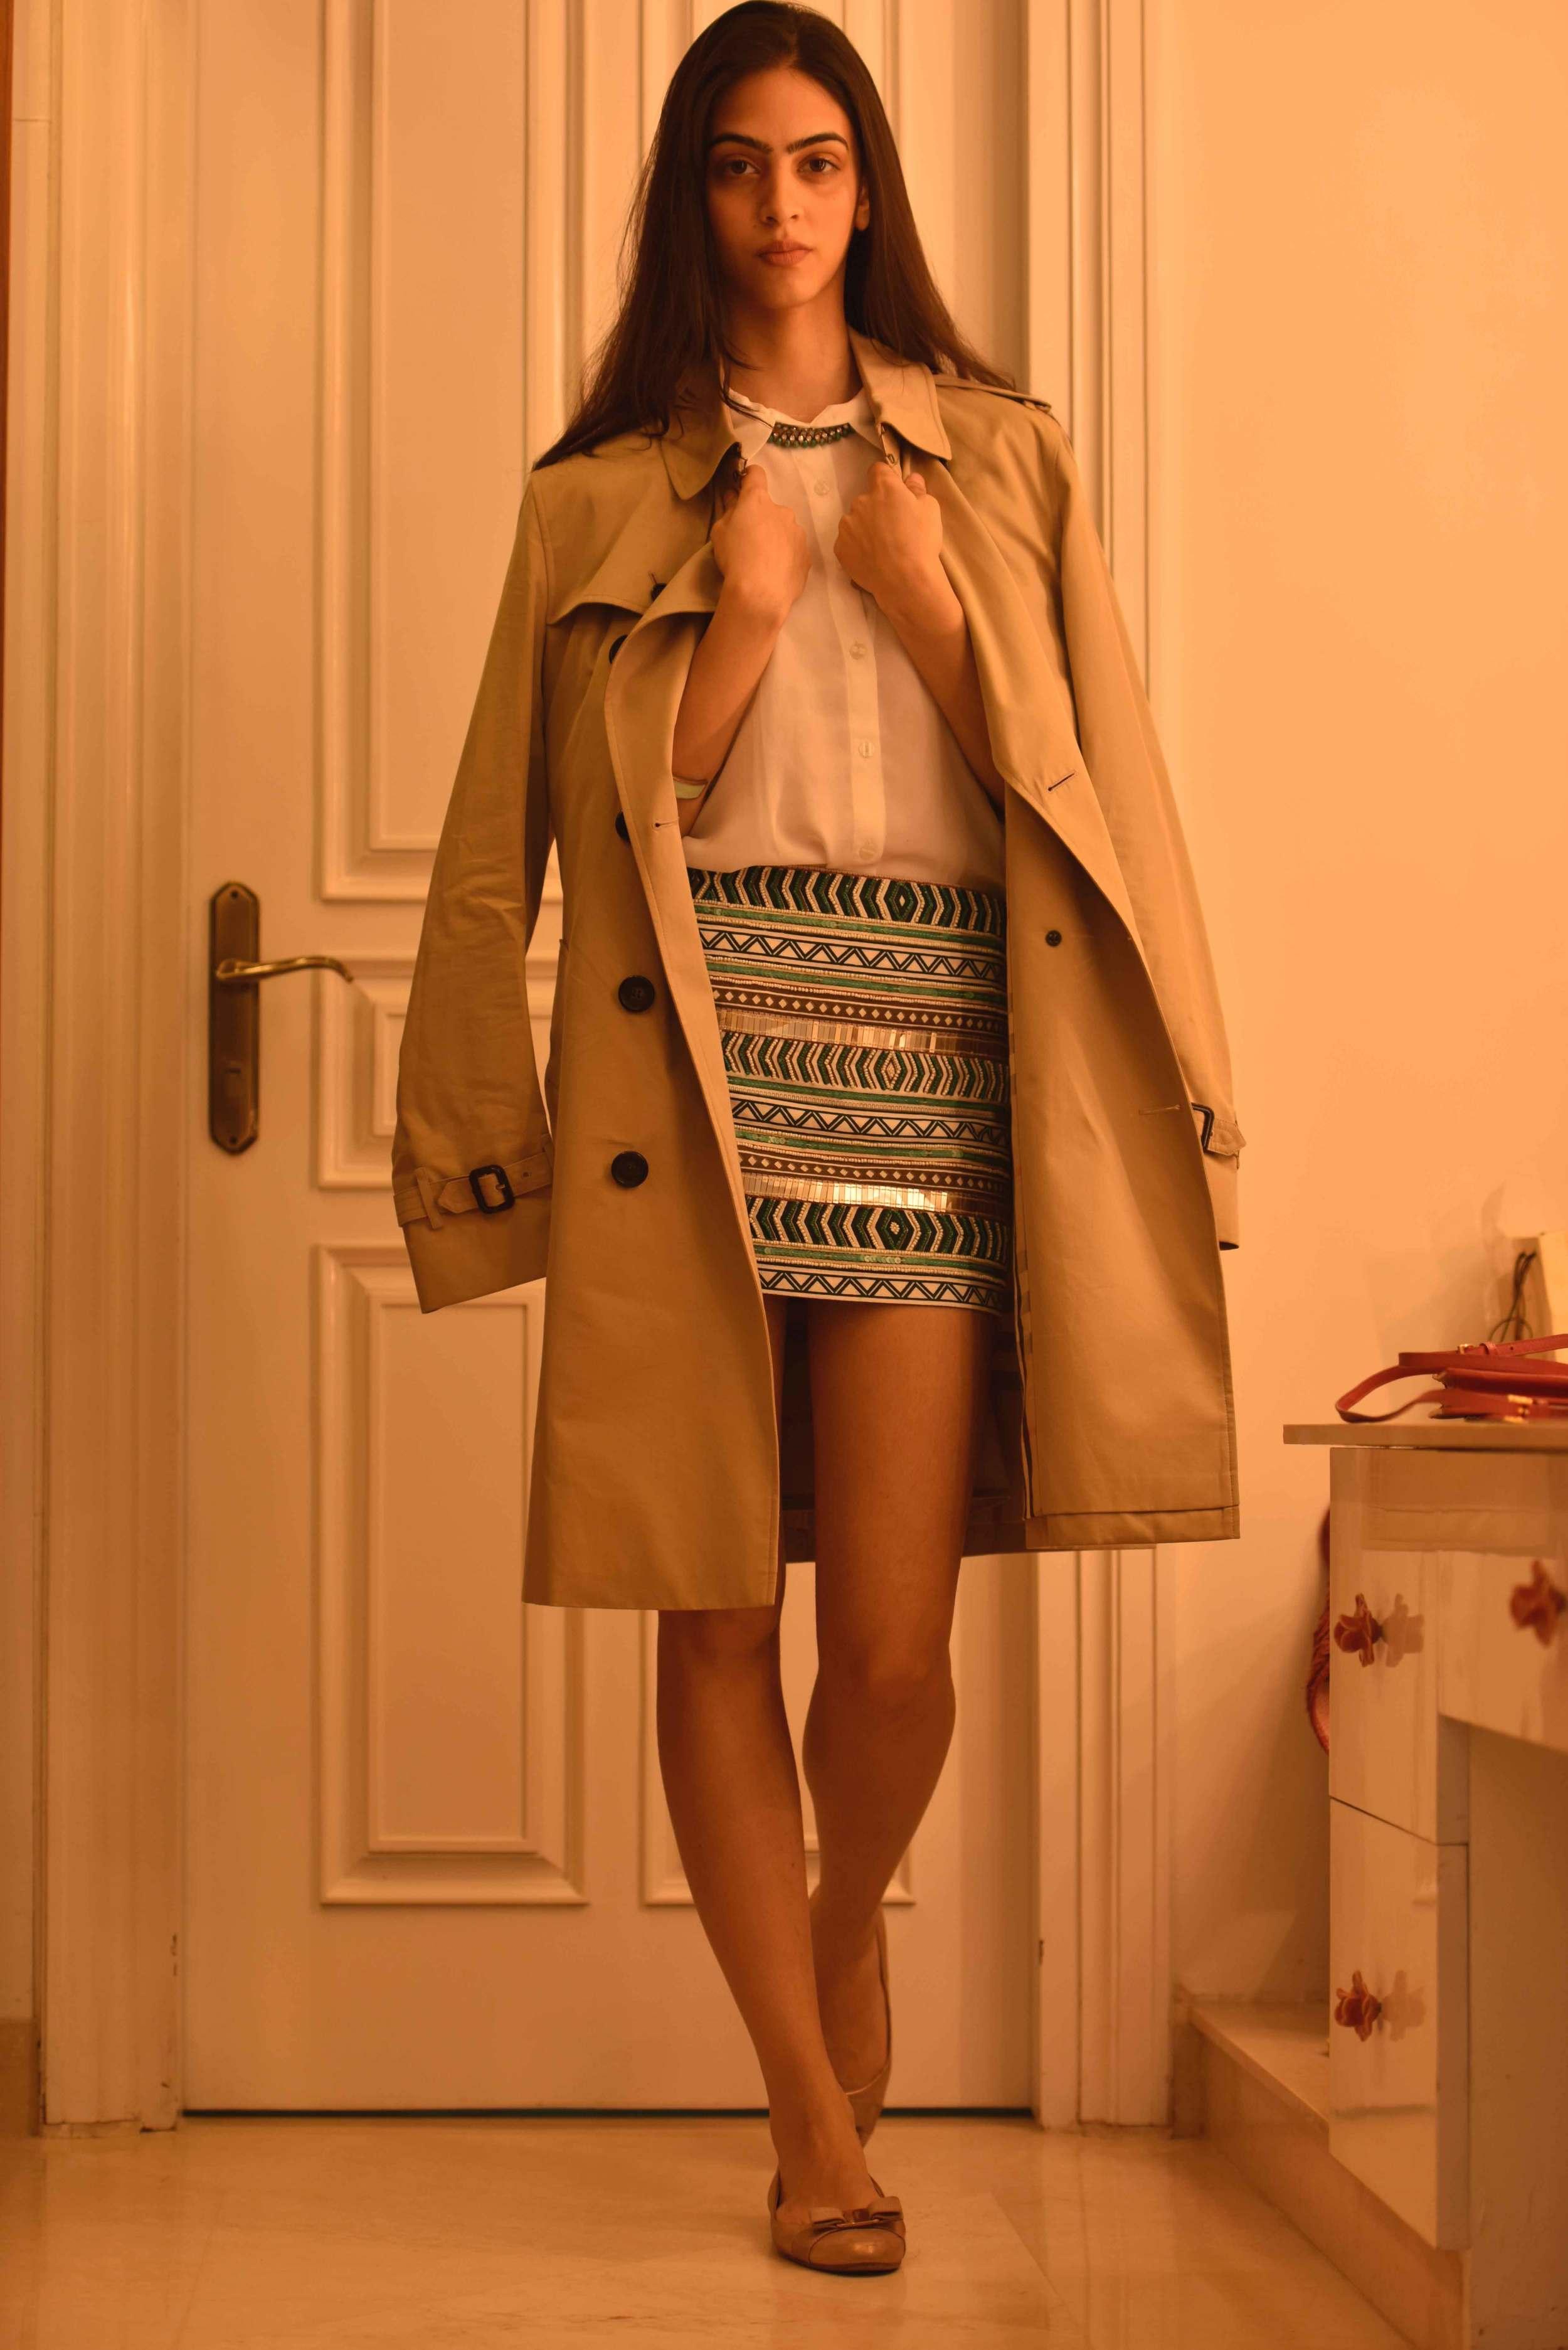 Zara mini-skirt, Ferragamo ballet flats and a Burberry trench. Image©gunjanvirk, Model: Mannat Dhaliwal.